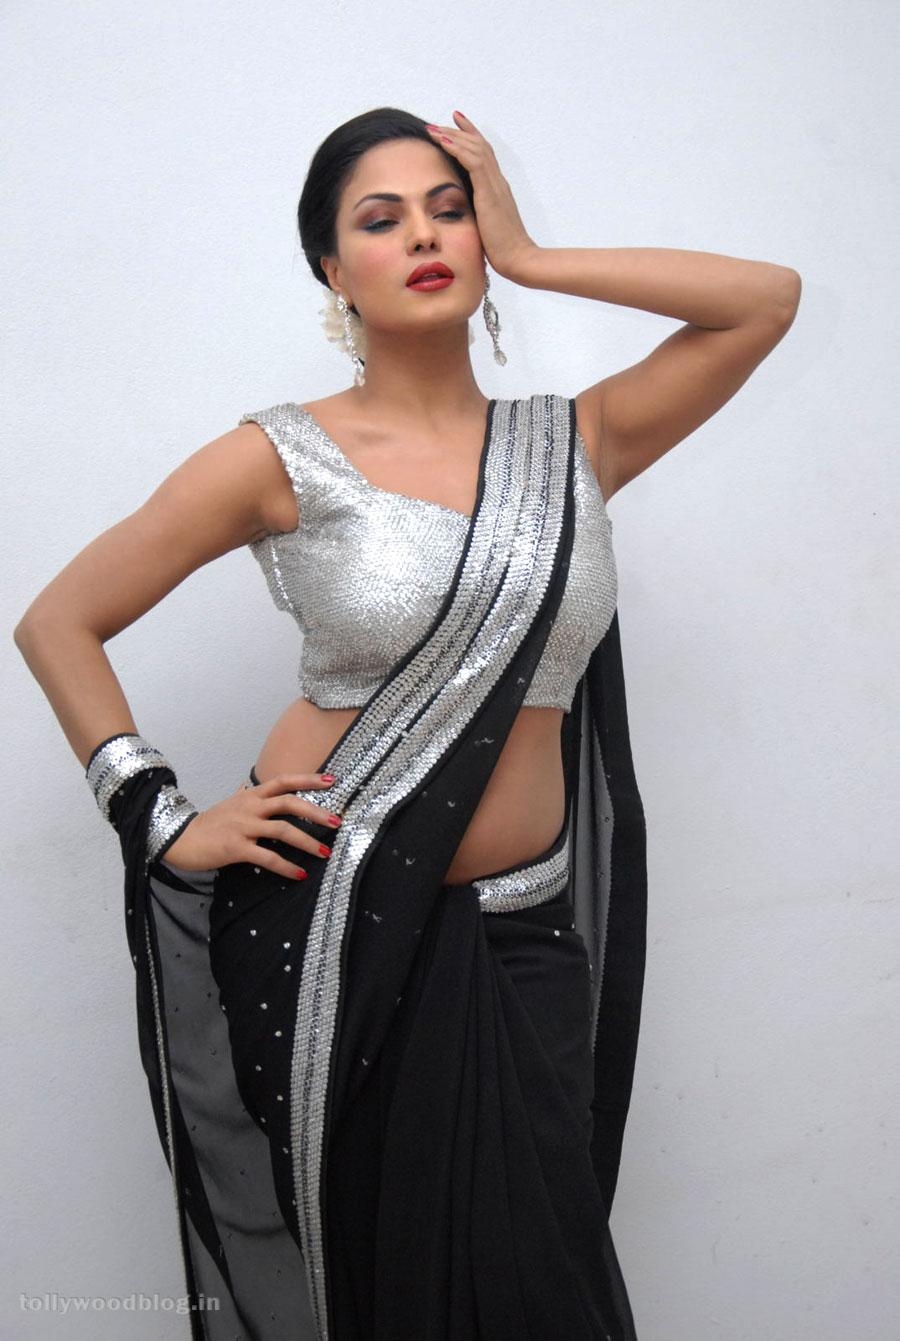 Veena Malik Latest Hot Photos Stills Gallery